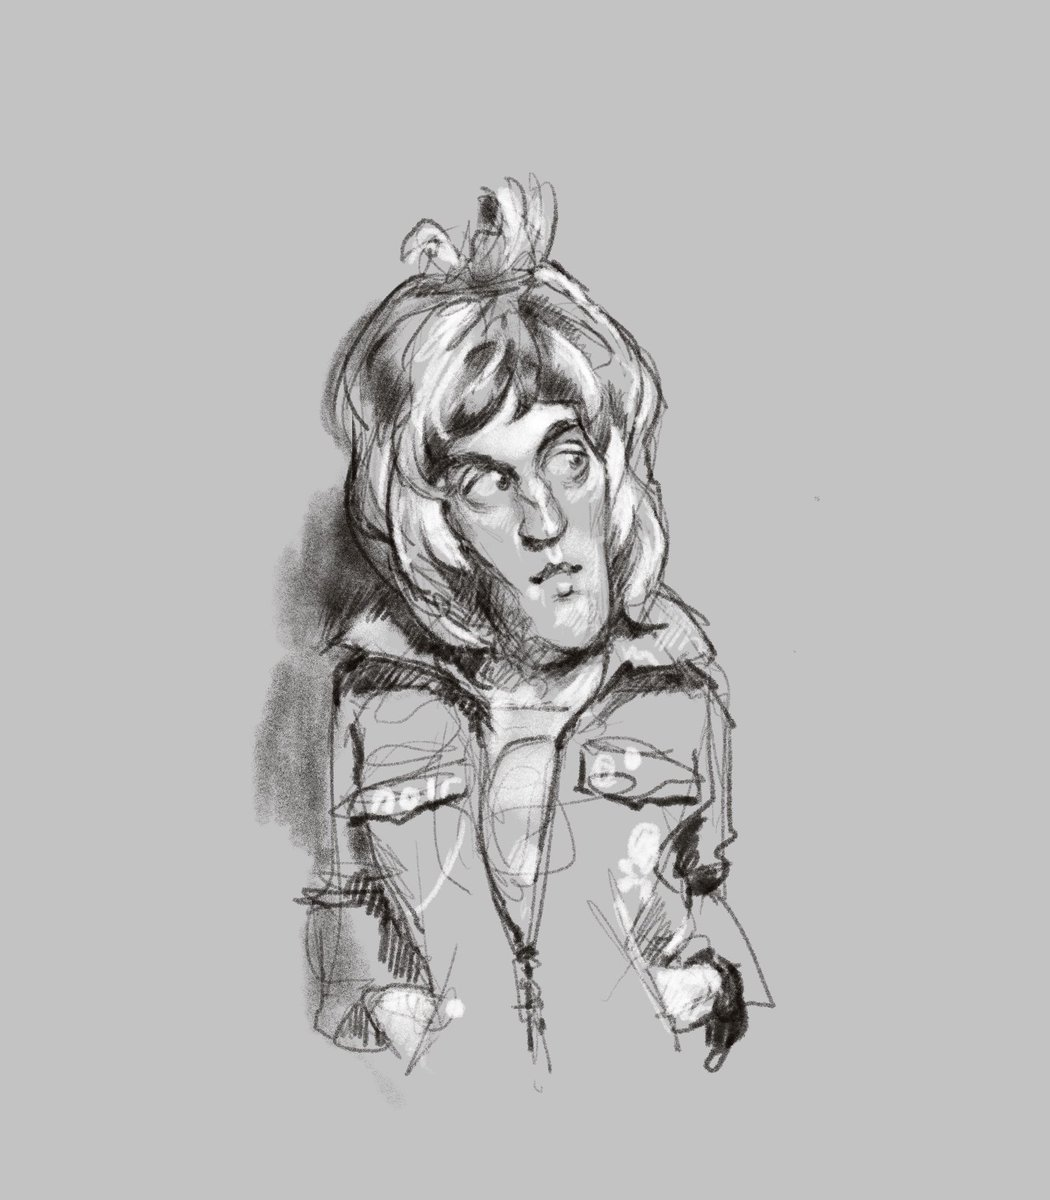 Vince Noir . . #crimp . . #boosh #noelfielding #howardmoon #themightyboosh #illustration #drawing #caricature #procreate #ipad #paperlike